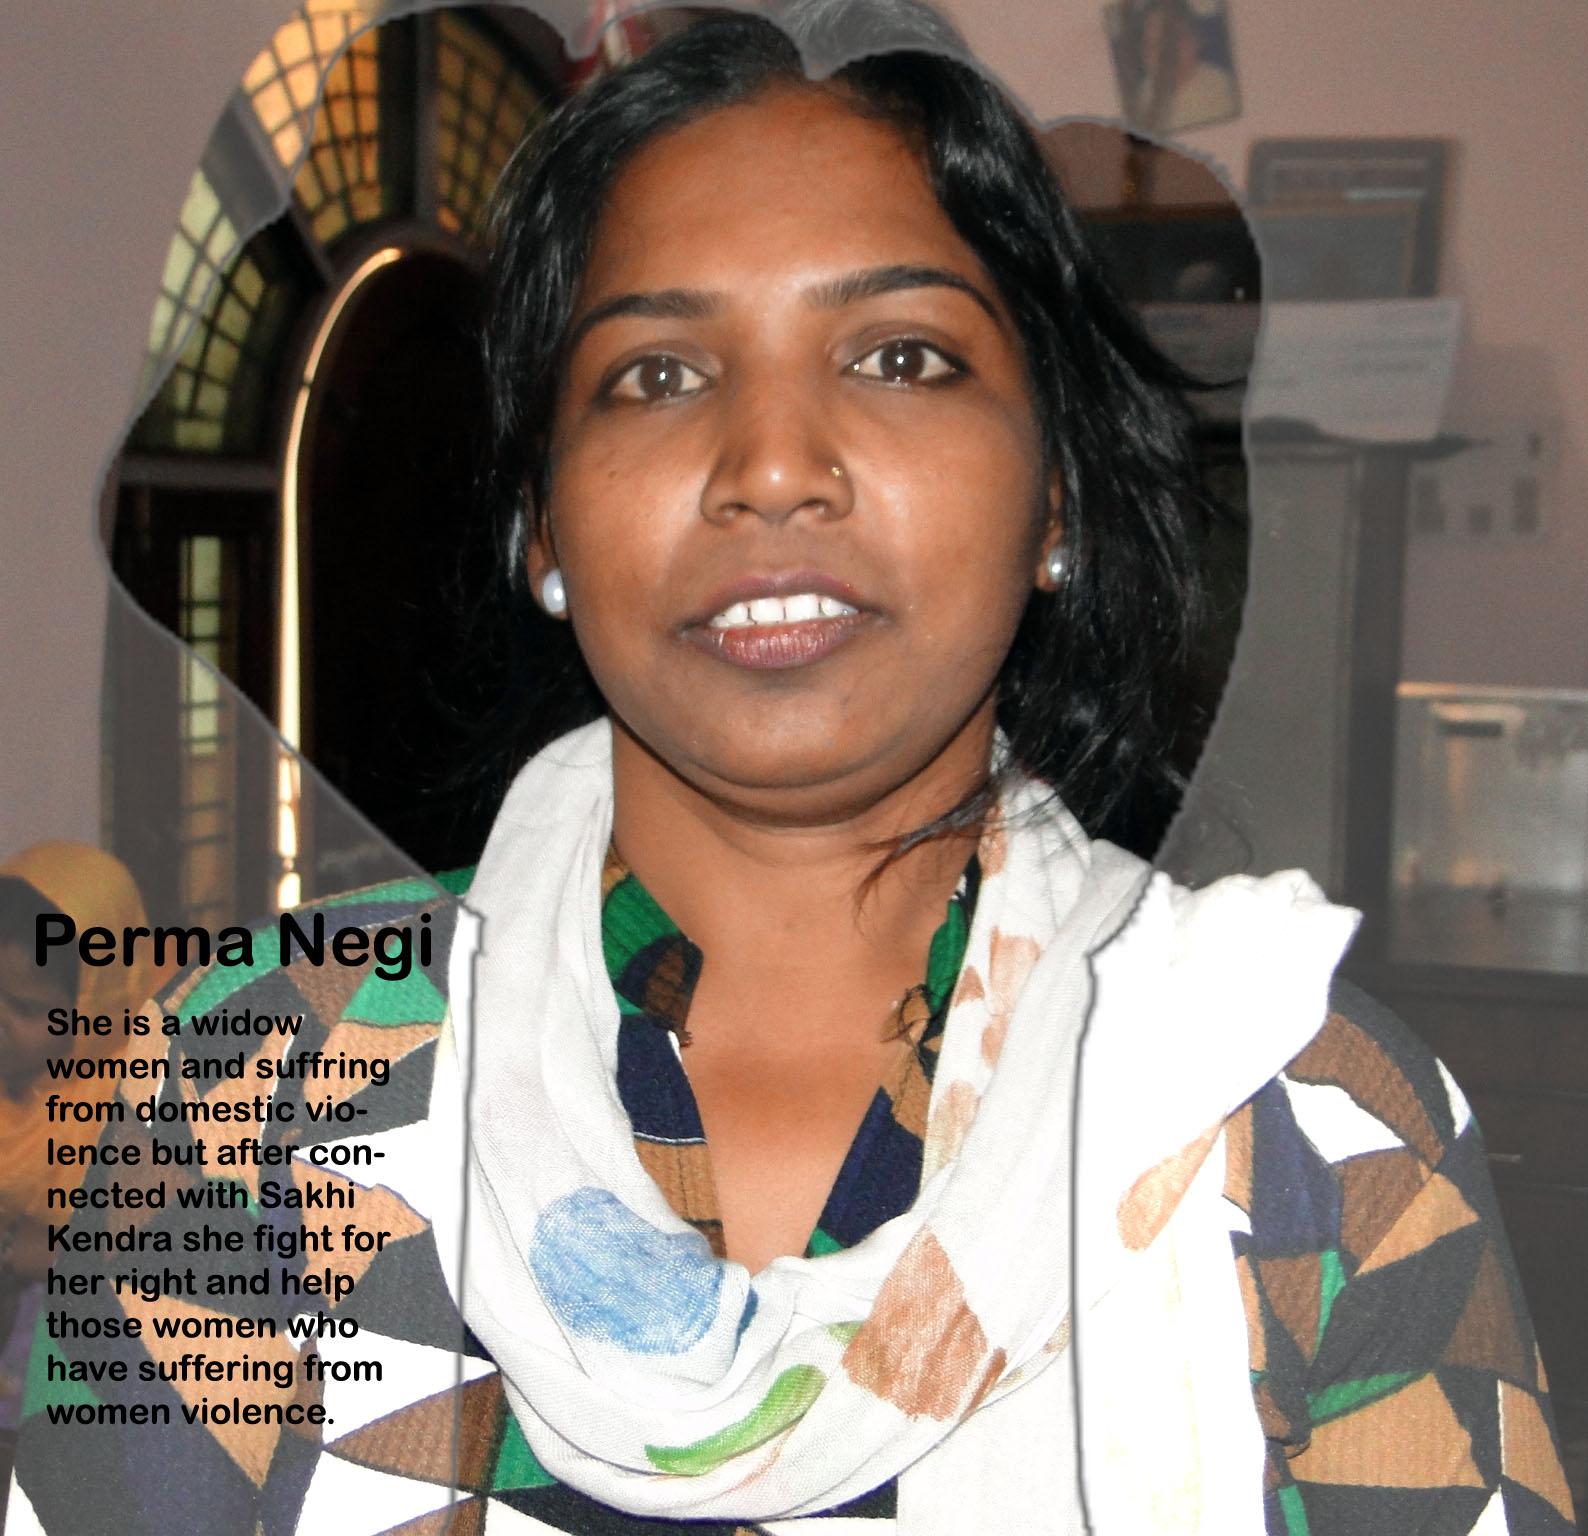 Parma neghi women human right defender--.jpg